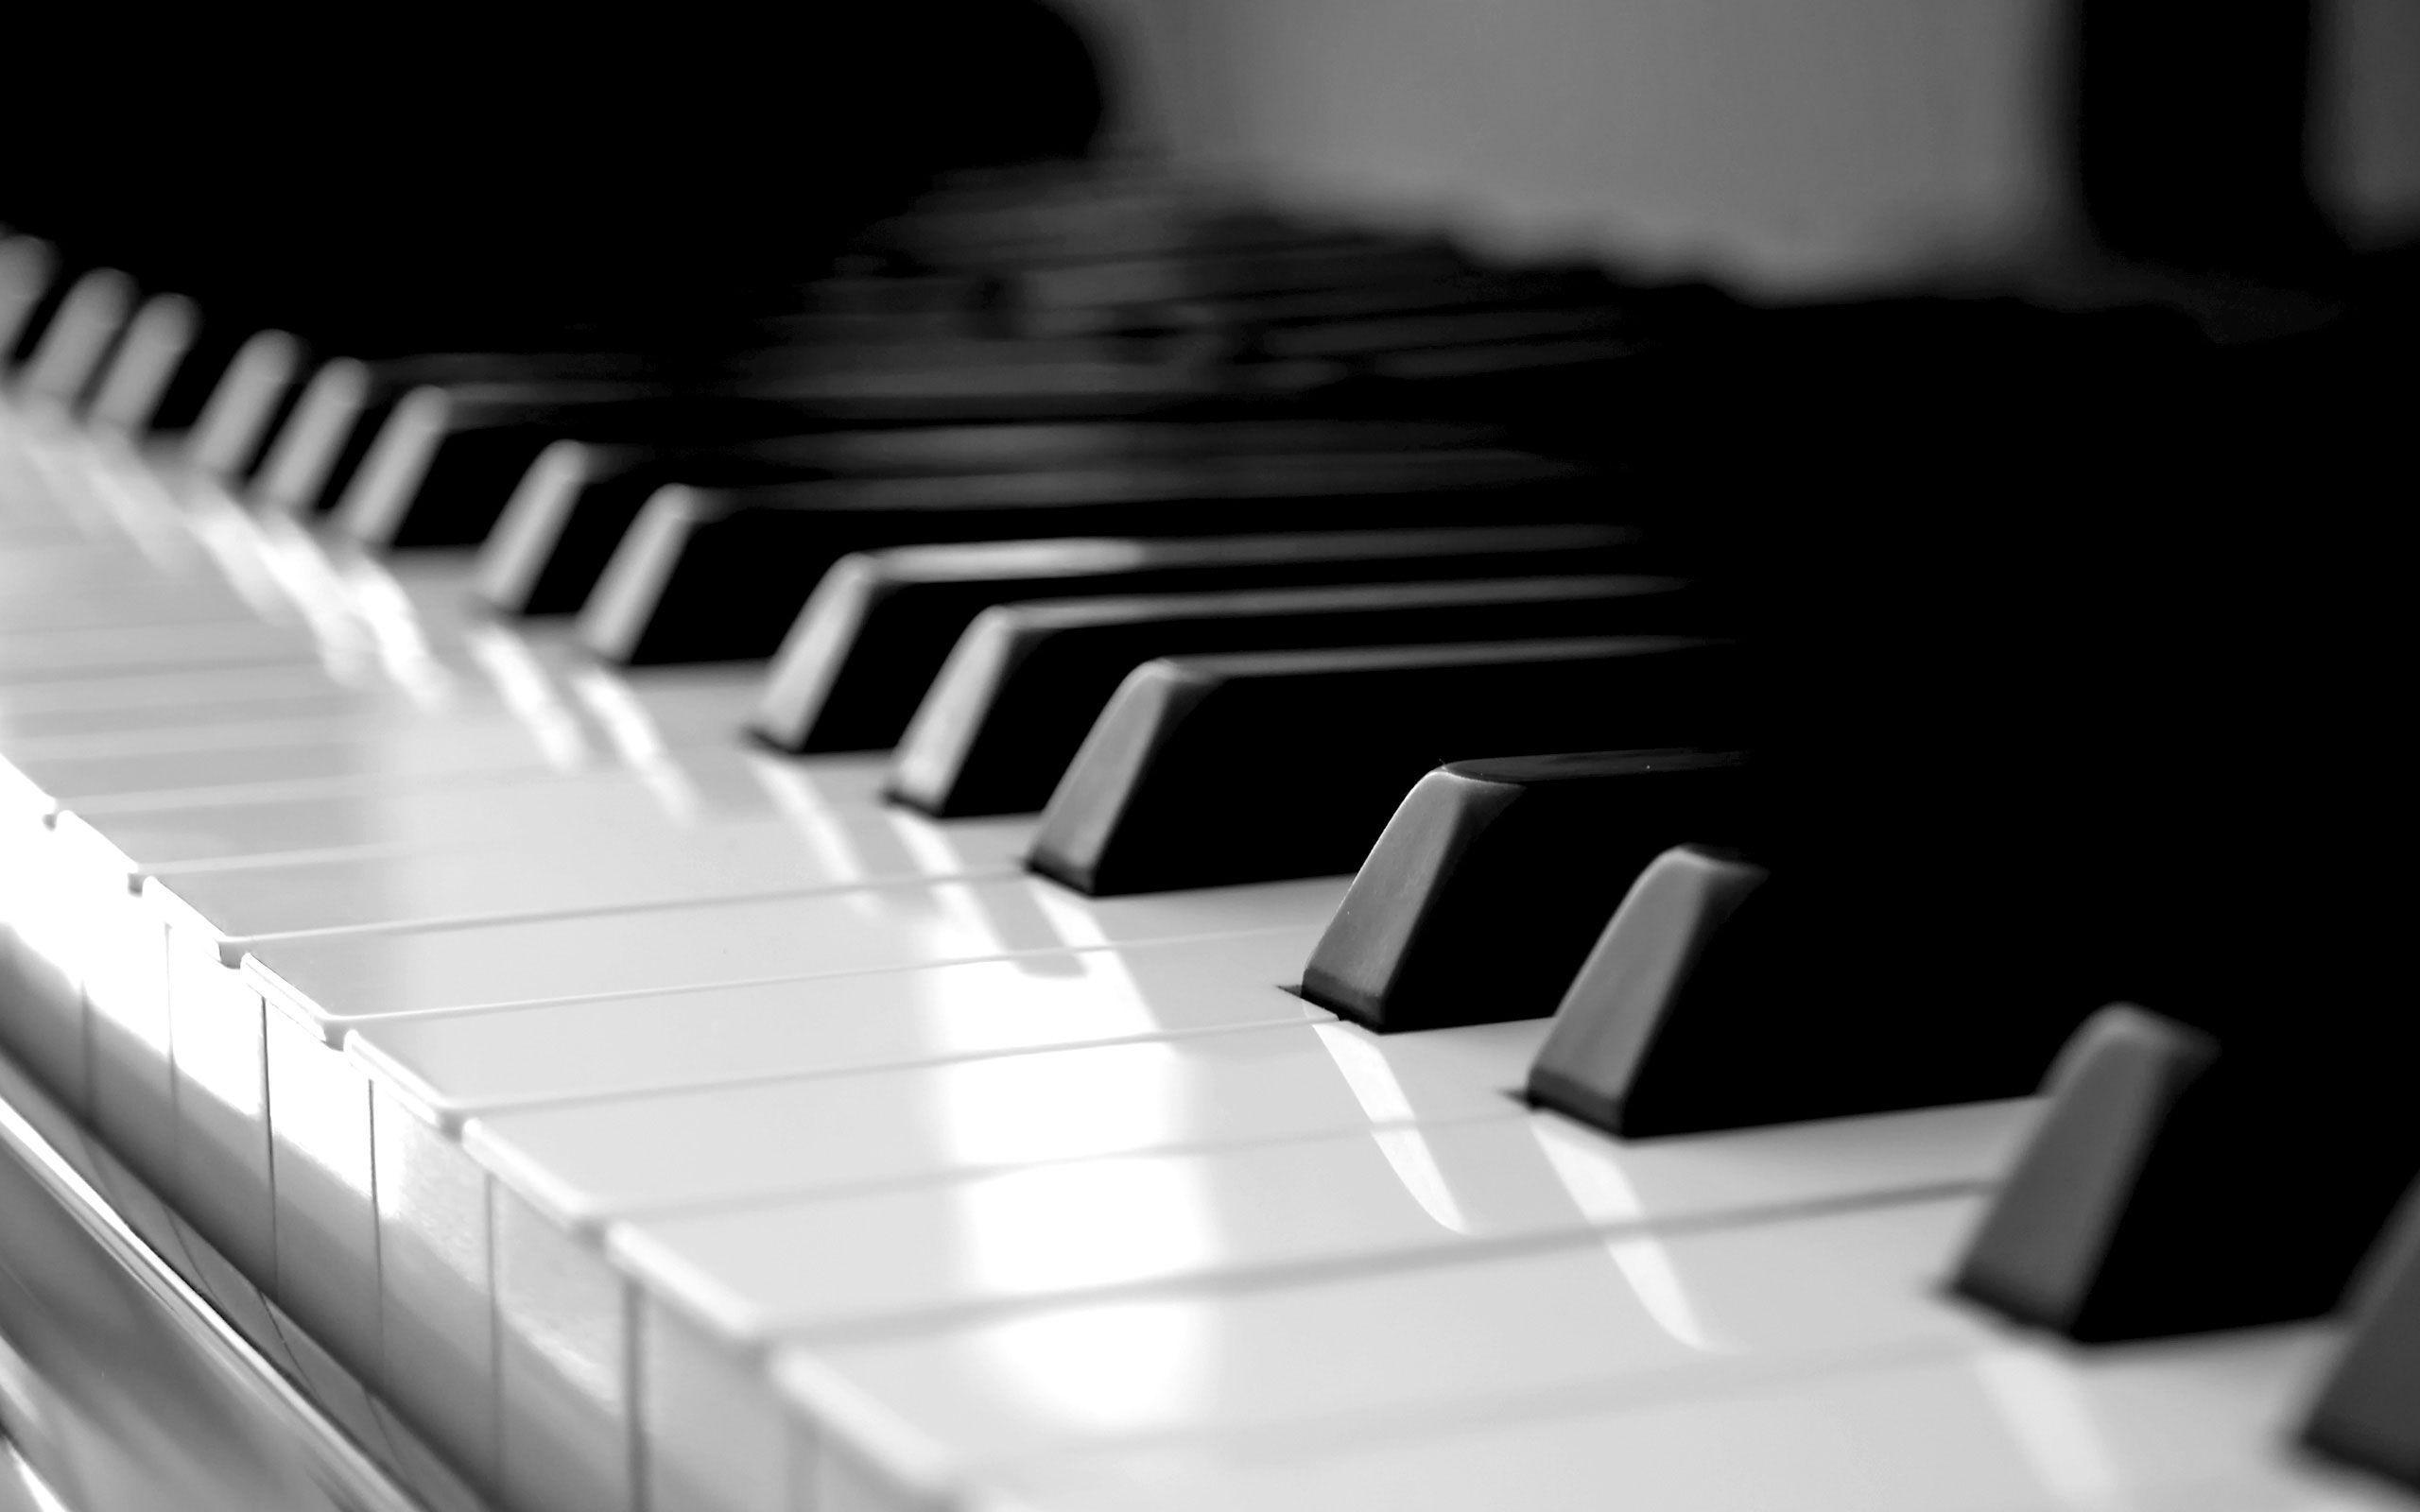 Piano Keys Wallpapers Top Free Piano Keys Backgrounds Wallpaperaccess